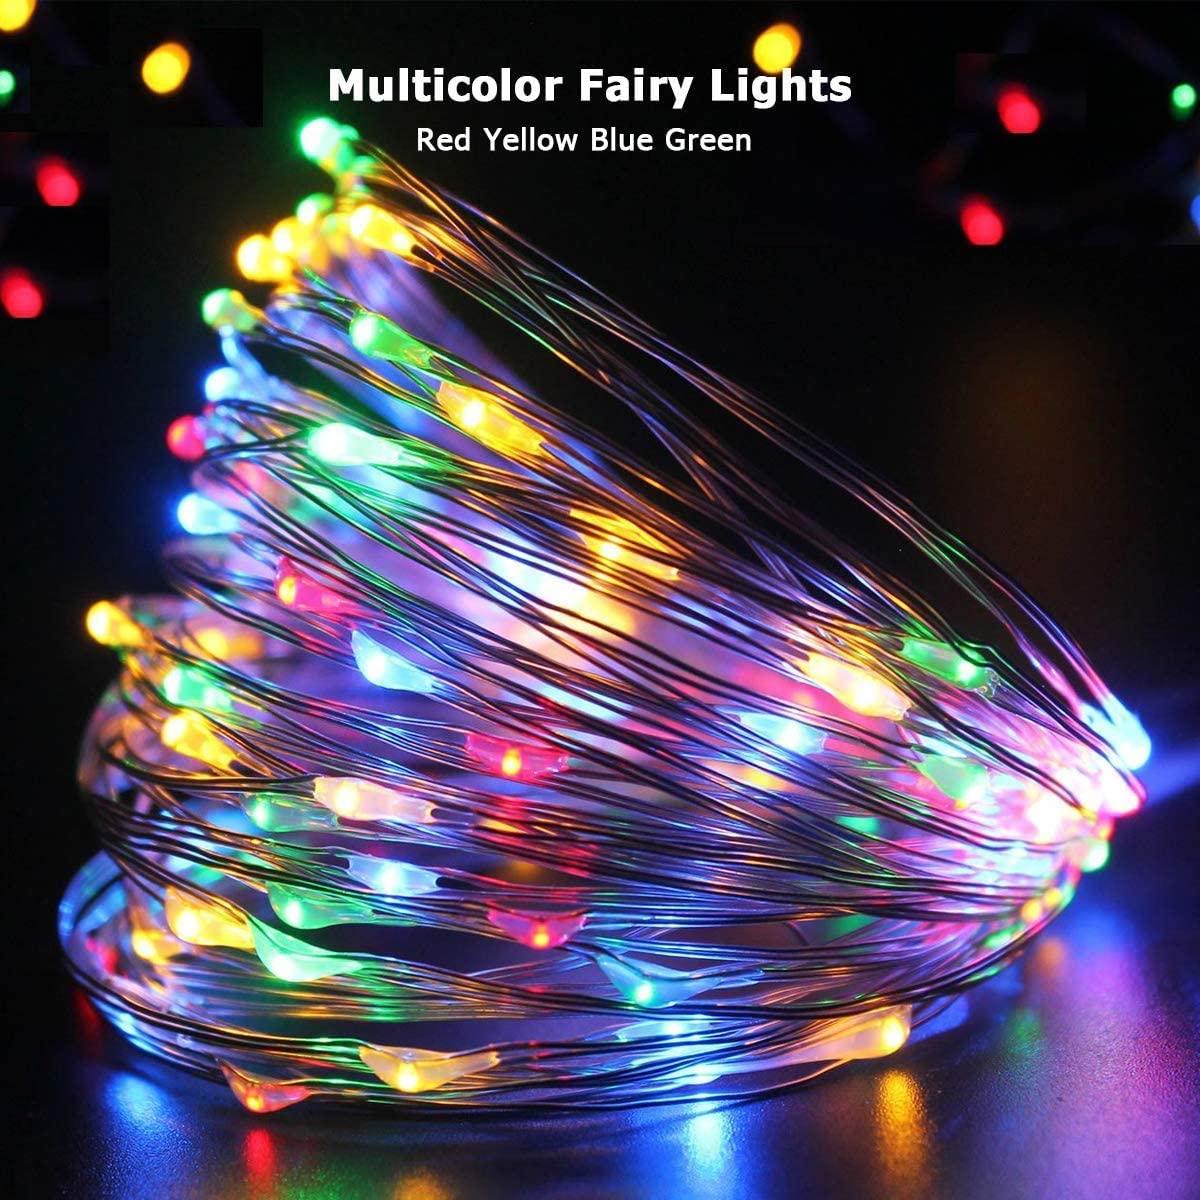 Fairy Stringไฟแบตเตอรี่Powered, 10M 100ไฟLEDกลางแจ้งกันน้ำสวน,8โหมดจับเวลา,XMASโคมไฟตกแต่ง